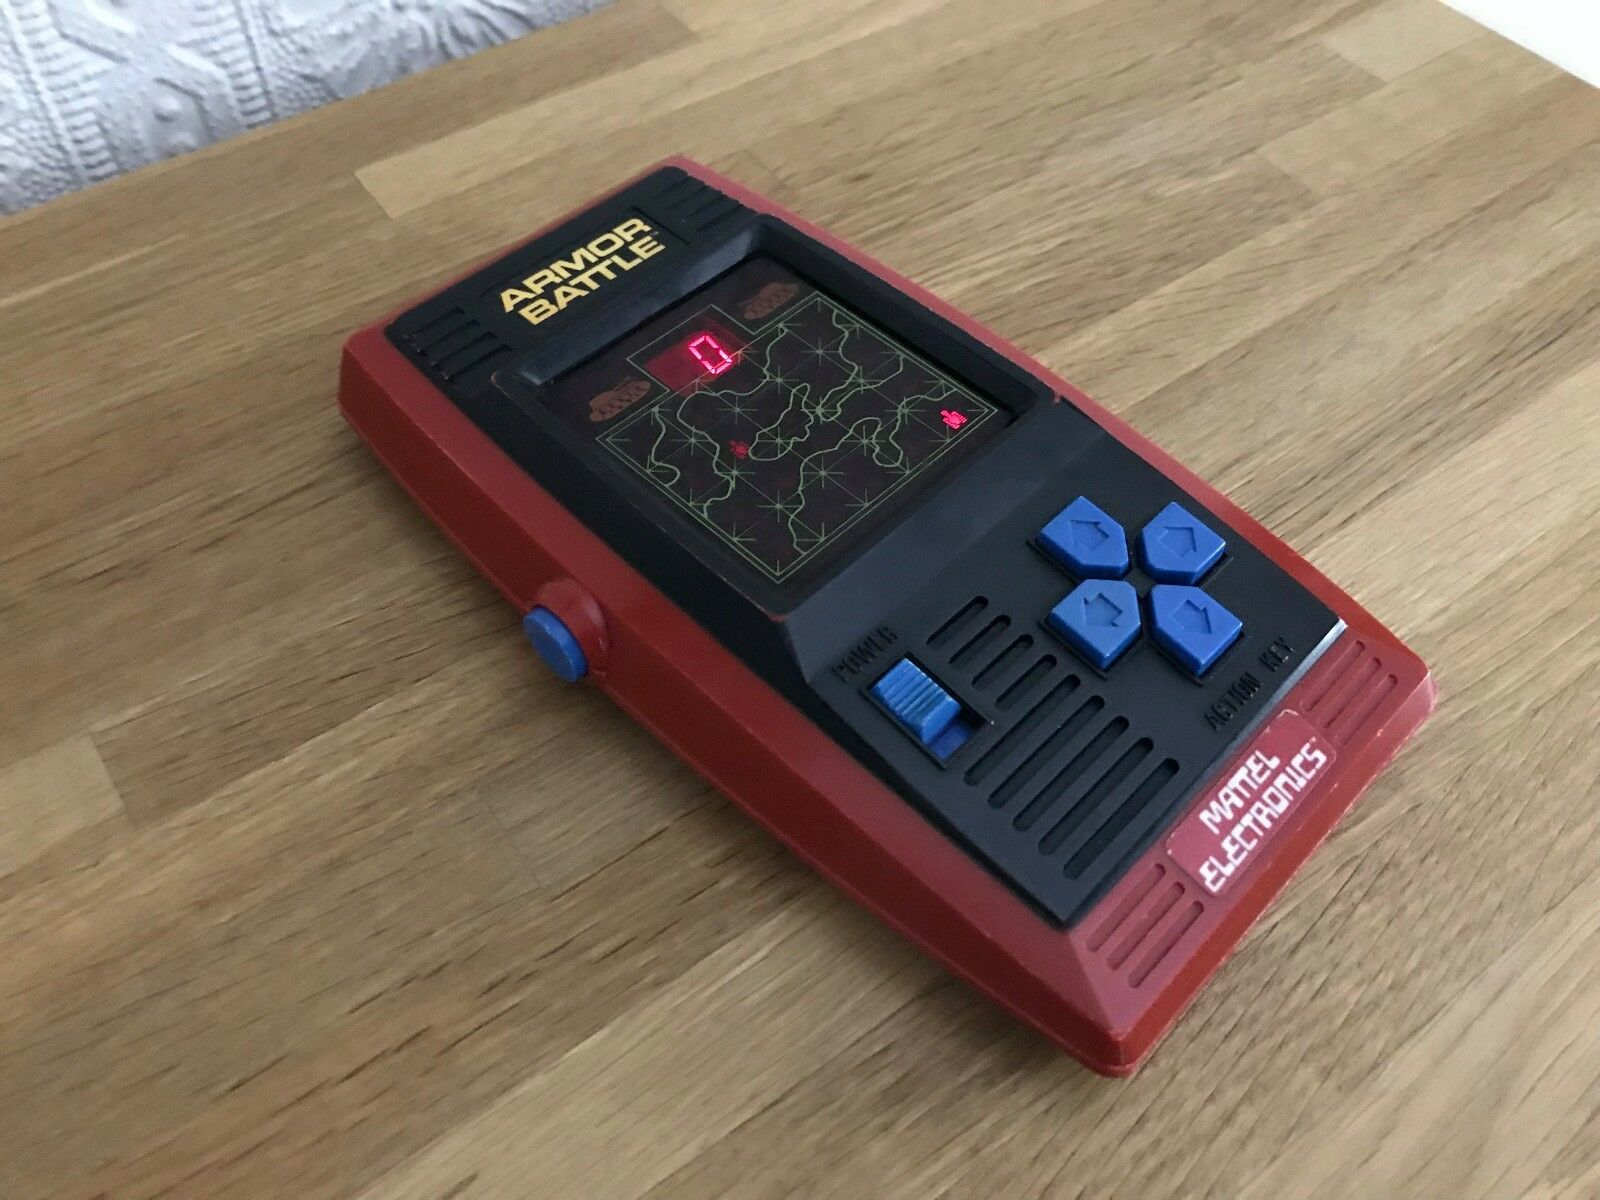 Very Rare Mattel Armor Battle Vintage 1978 LED Handheld Electronic Game